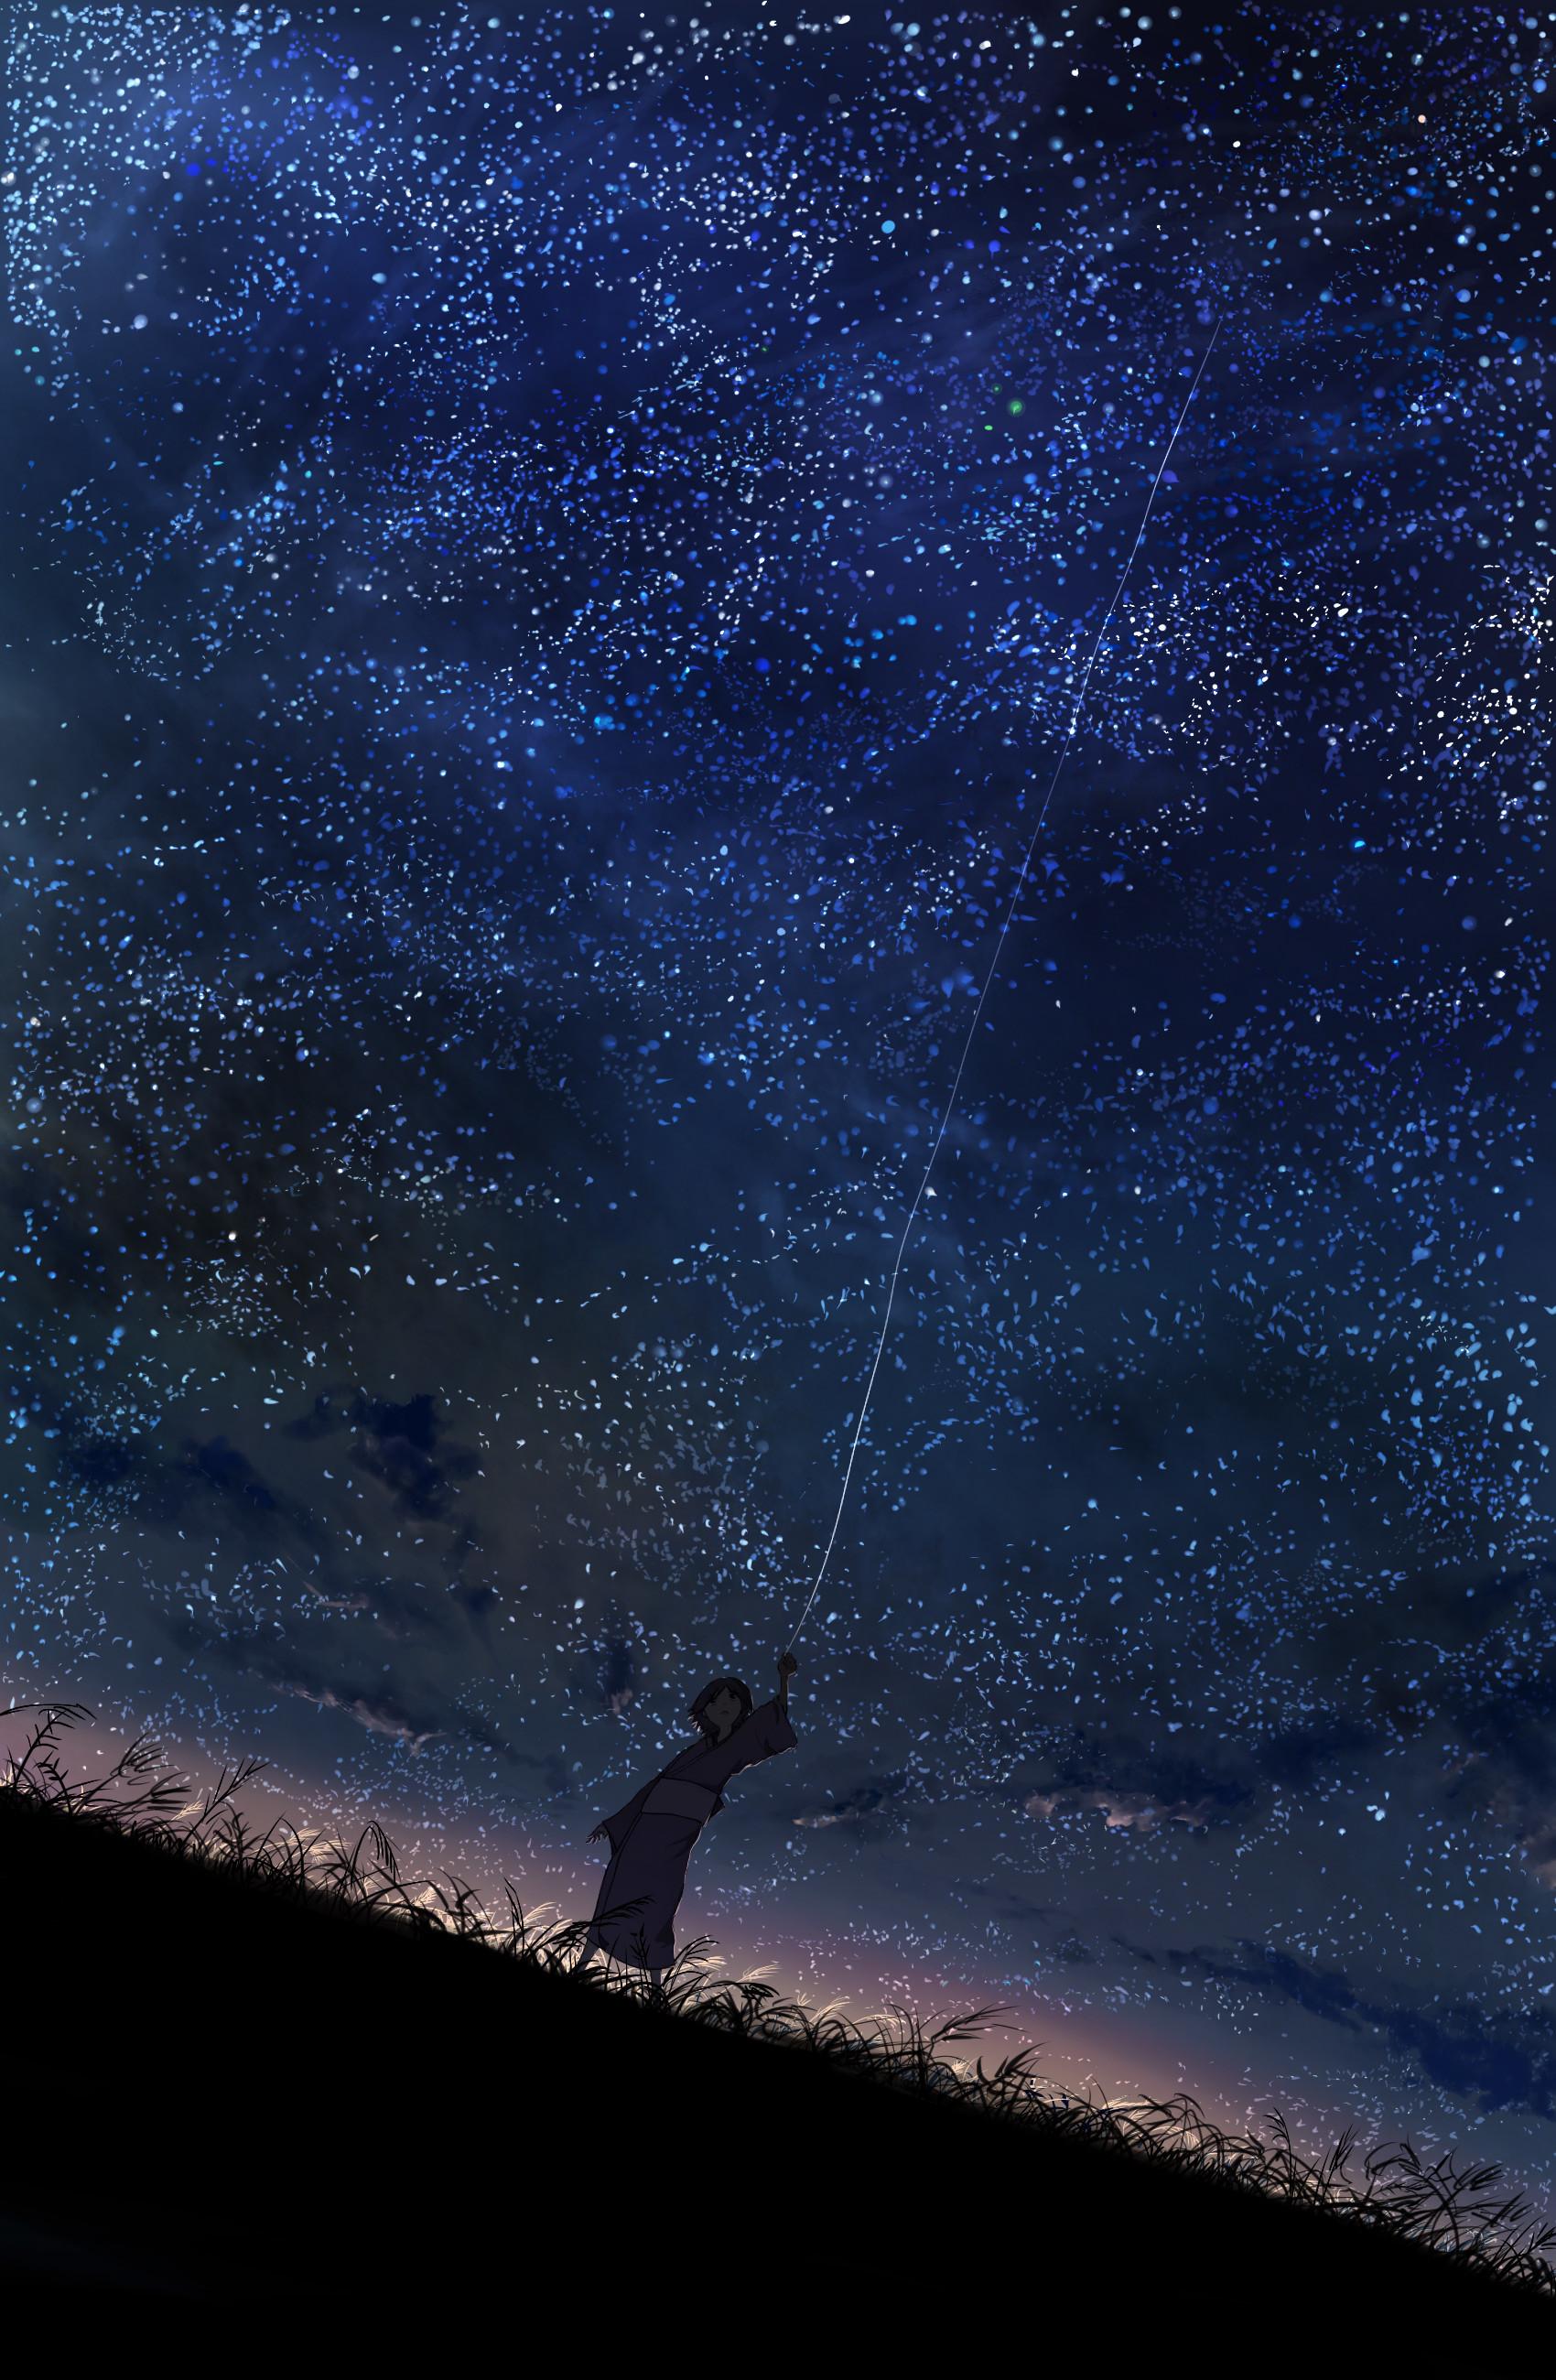 Stars Mushishi Night Sky Fresh New Hd Wallpaper [Your Popular HD Wallpaper]  #ID53049